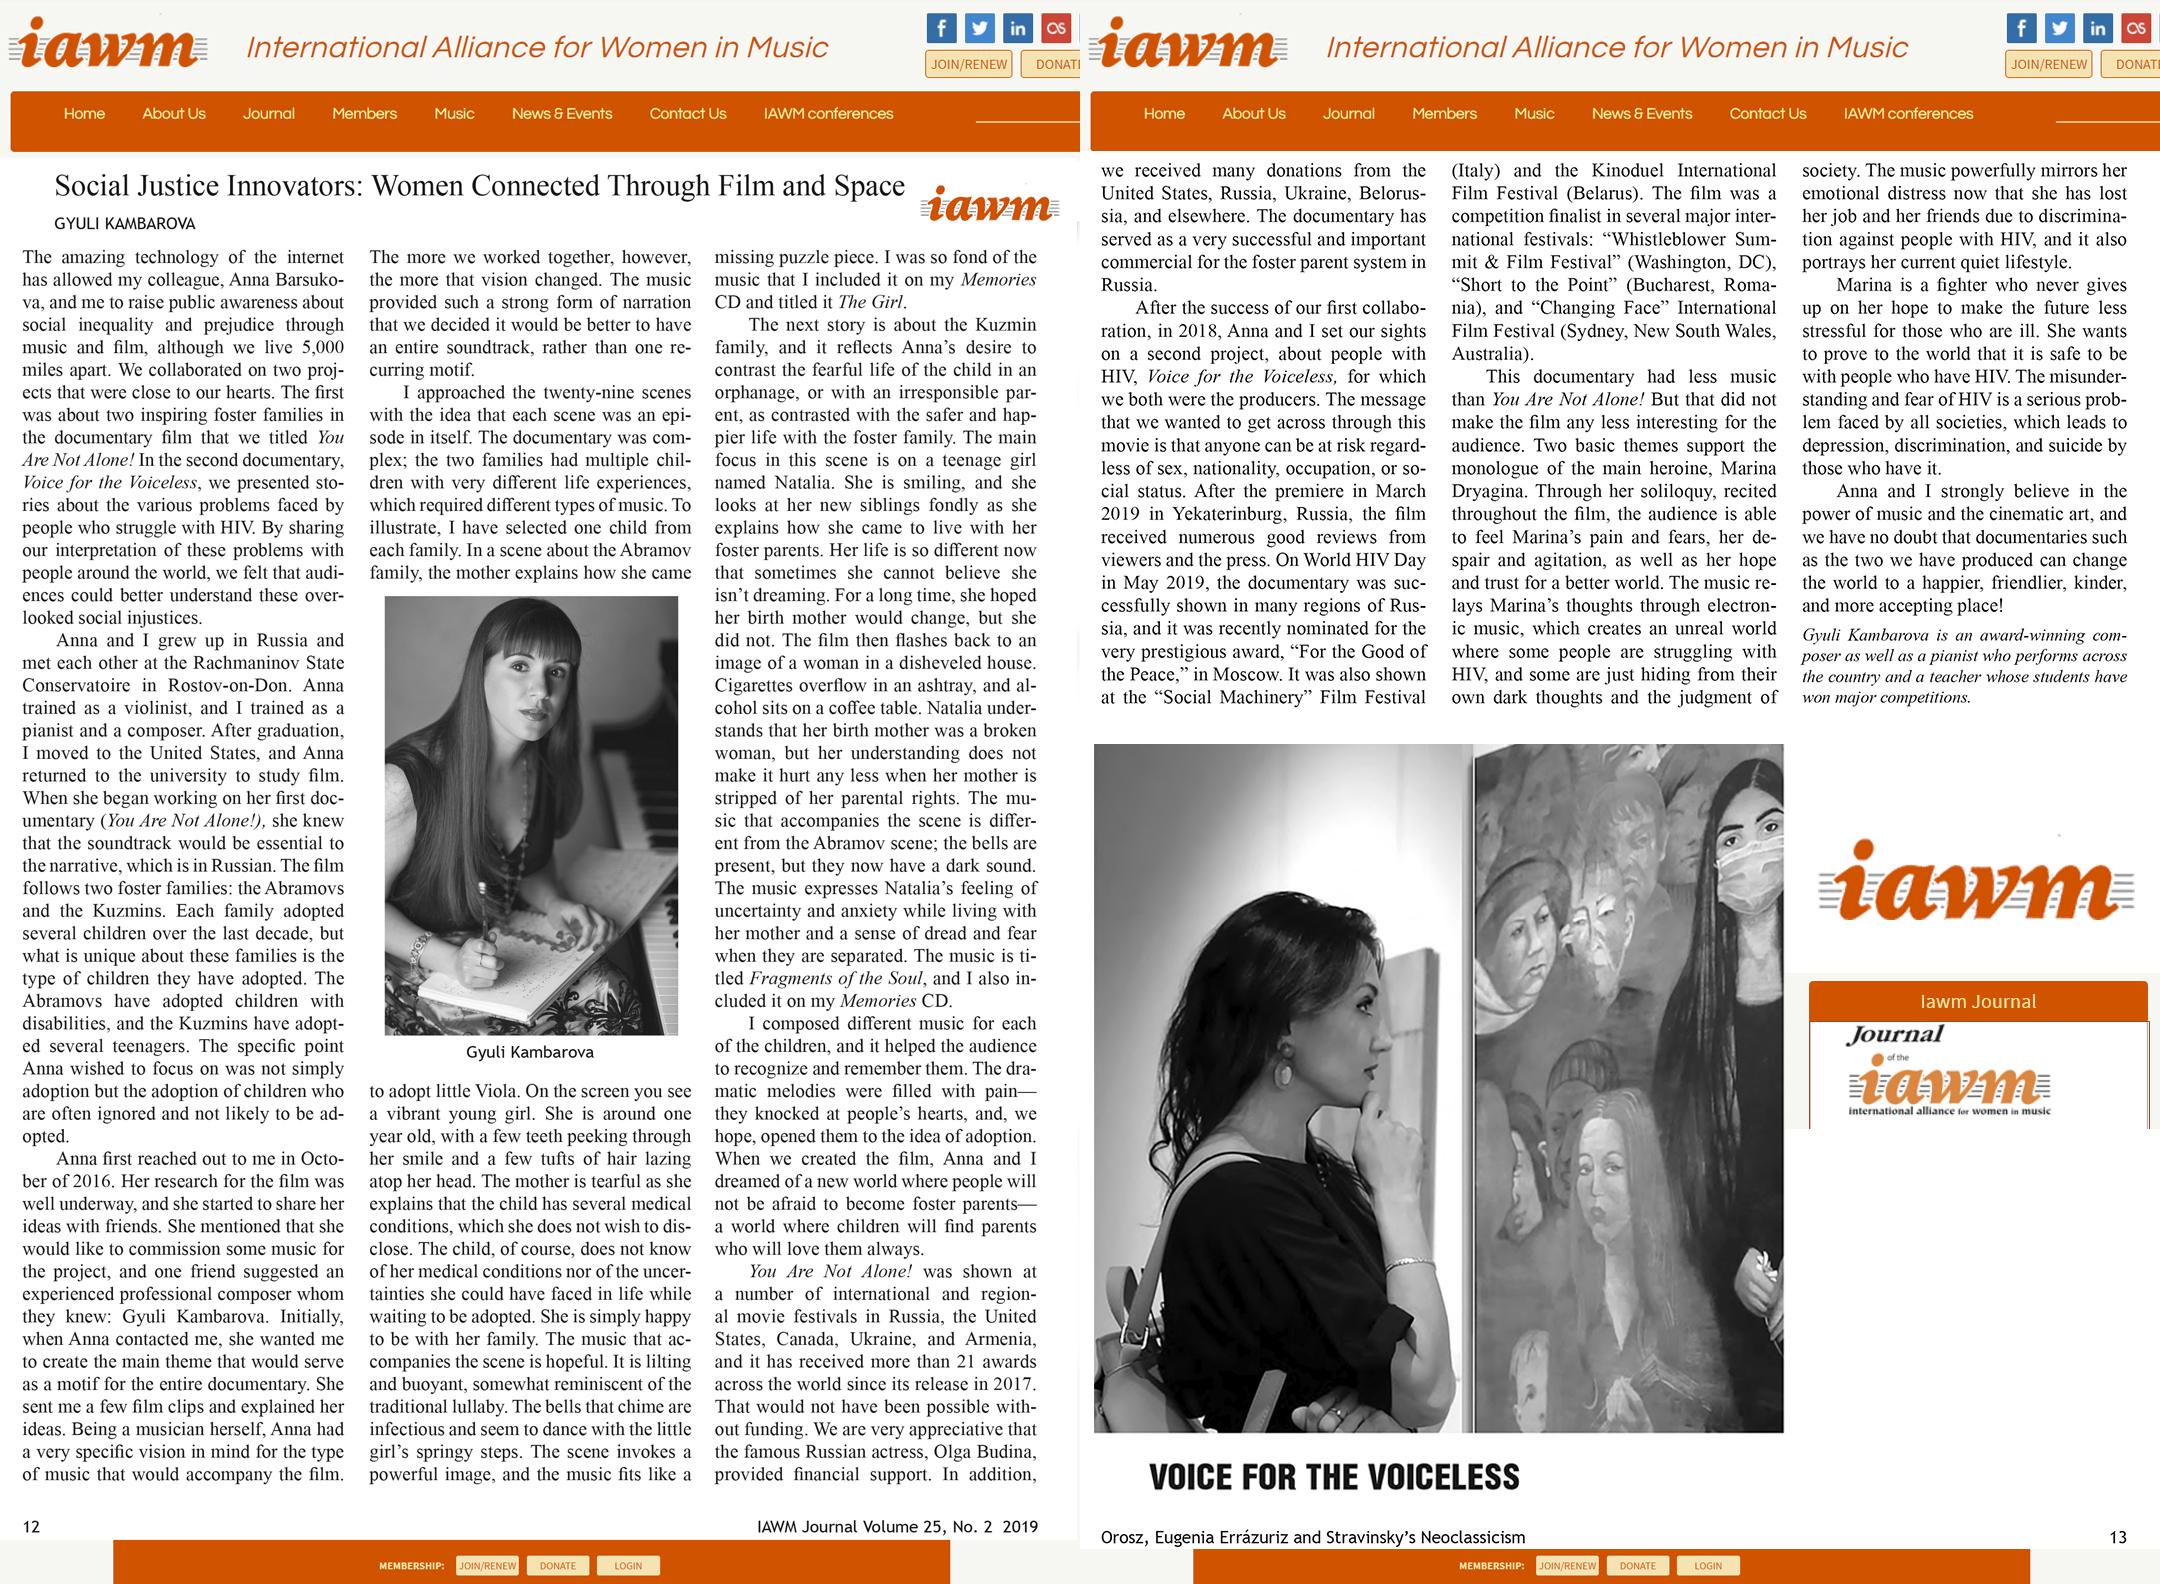 Публикация о нашем композиторе и о фильме в журнале «IAWM» — The International Alliance for Women in Music